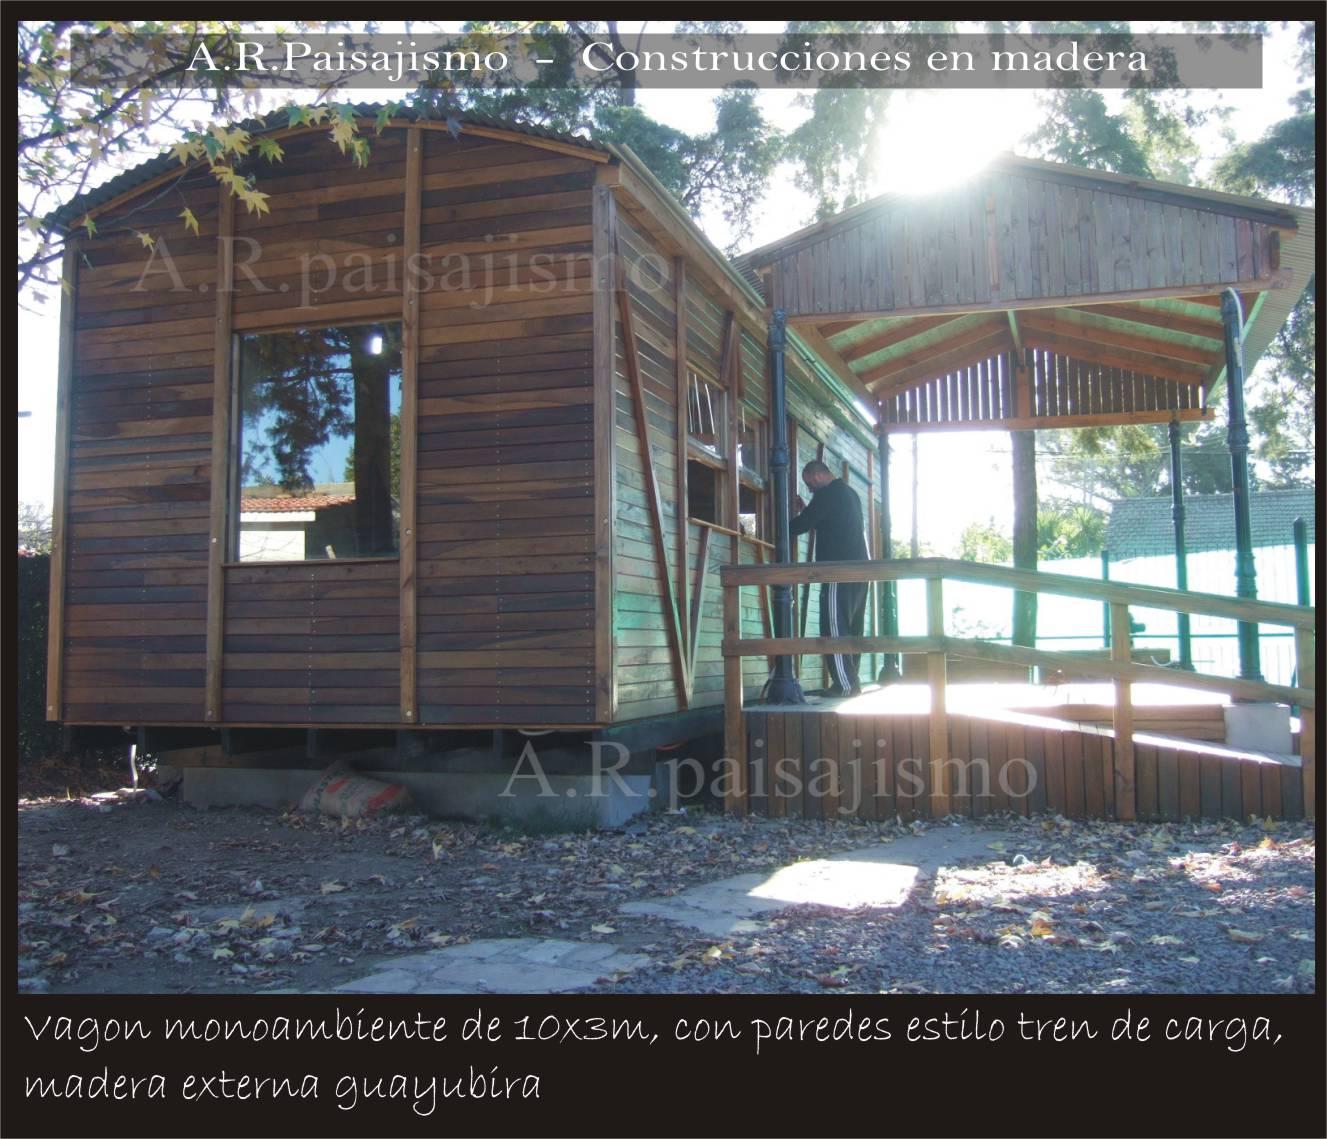 Vagon caba as de madera construccion tren replica bungalow - Construccion de bungalows ...